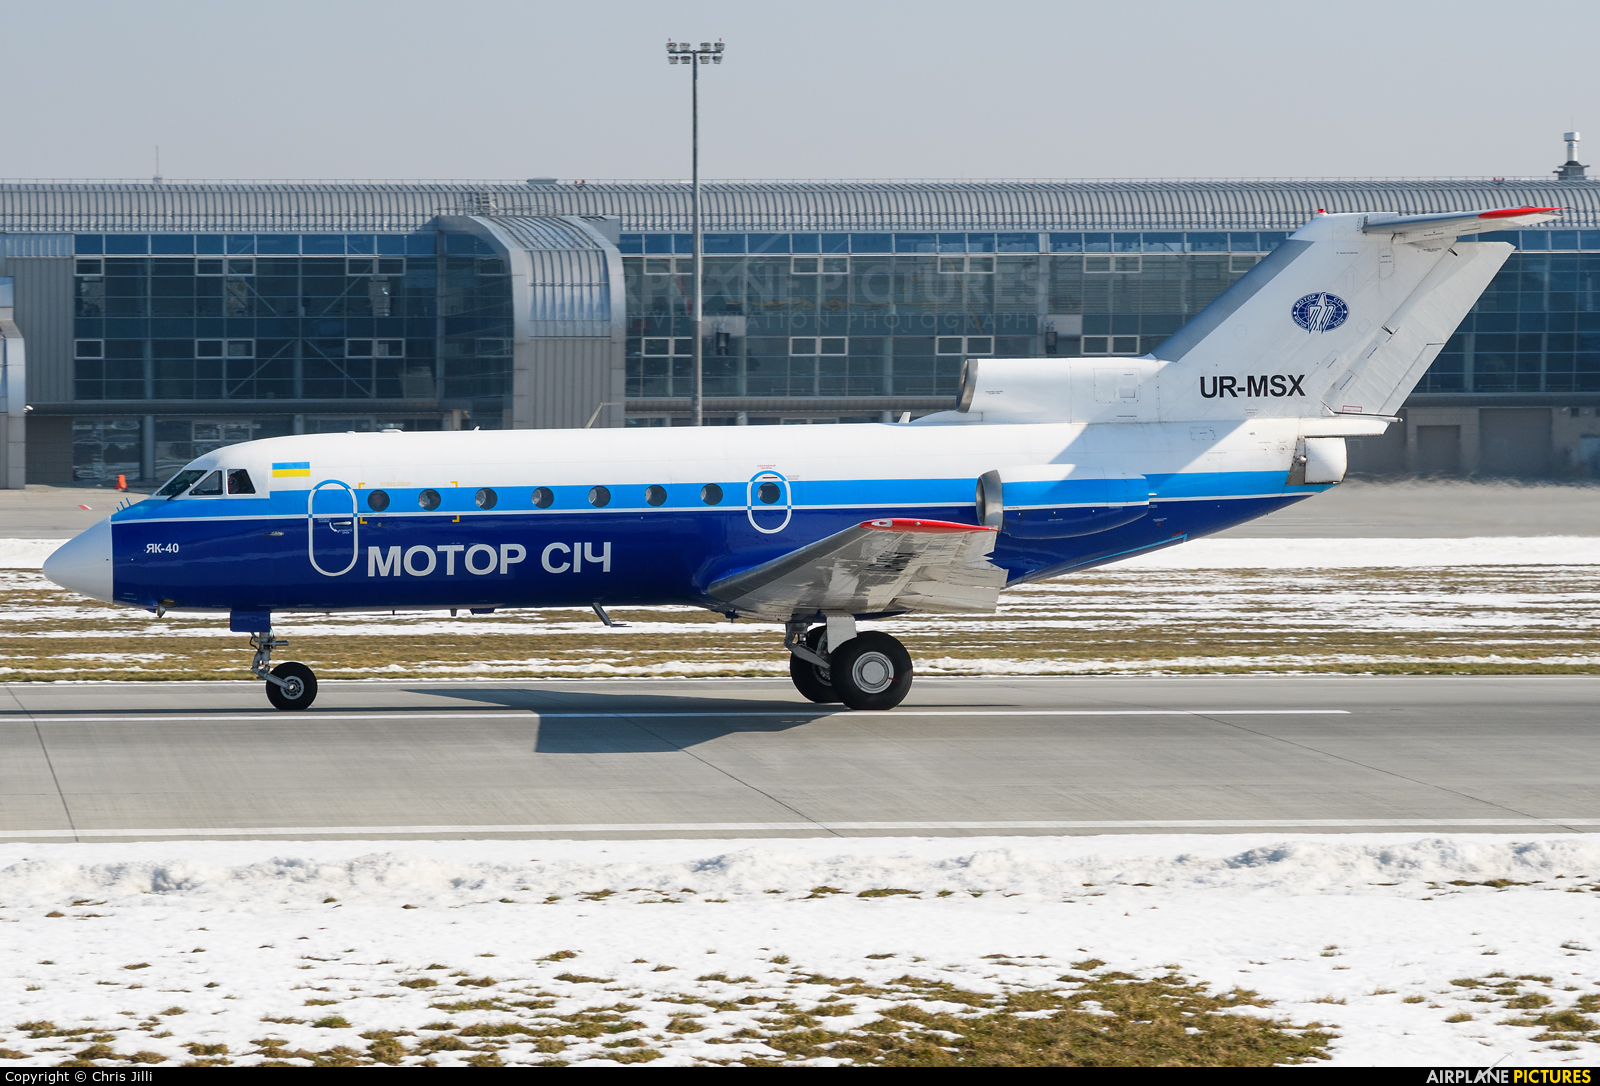 Motor Sich UR-MSX aircraft at Lviv Danylo Halytskyi International Airport (Lwów Skniłów)